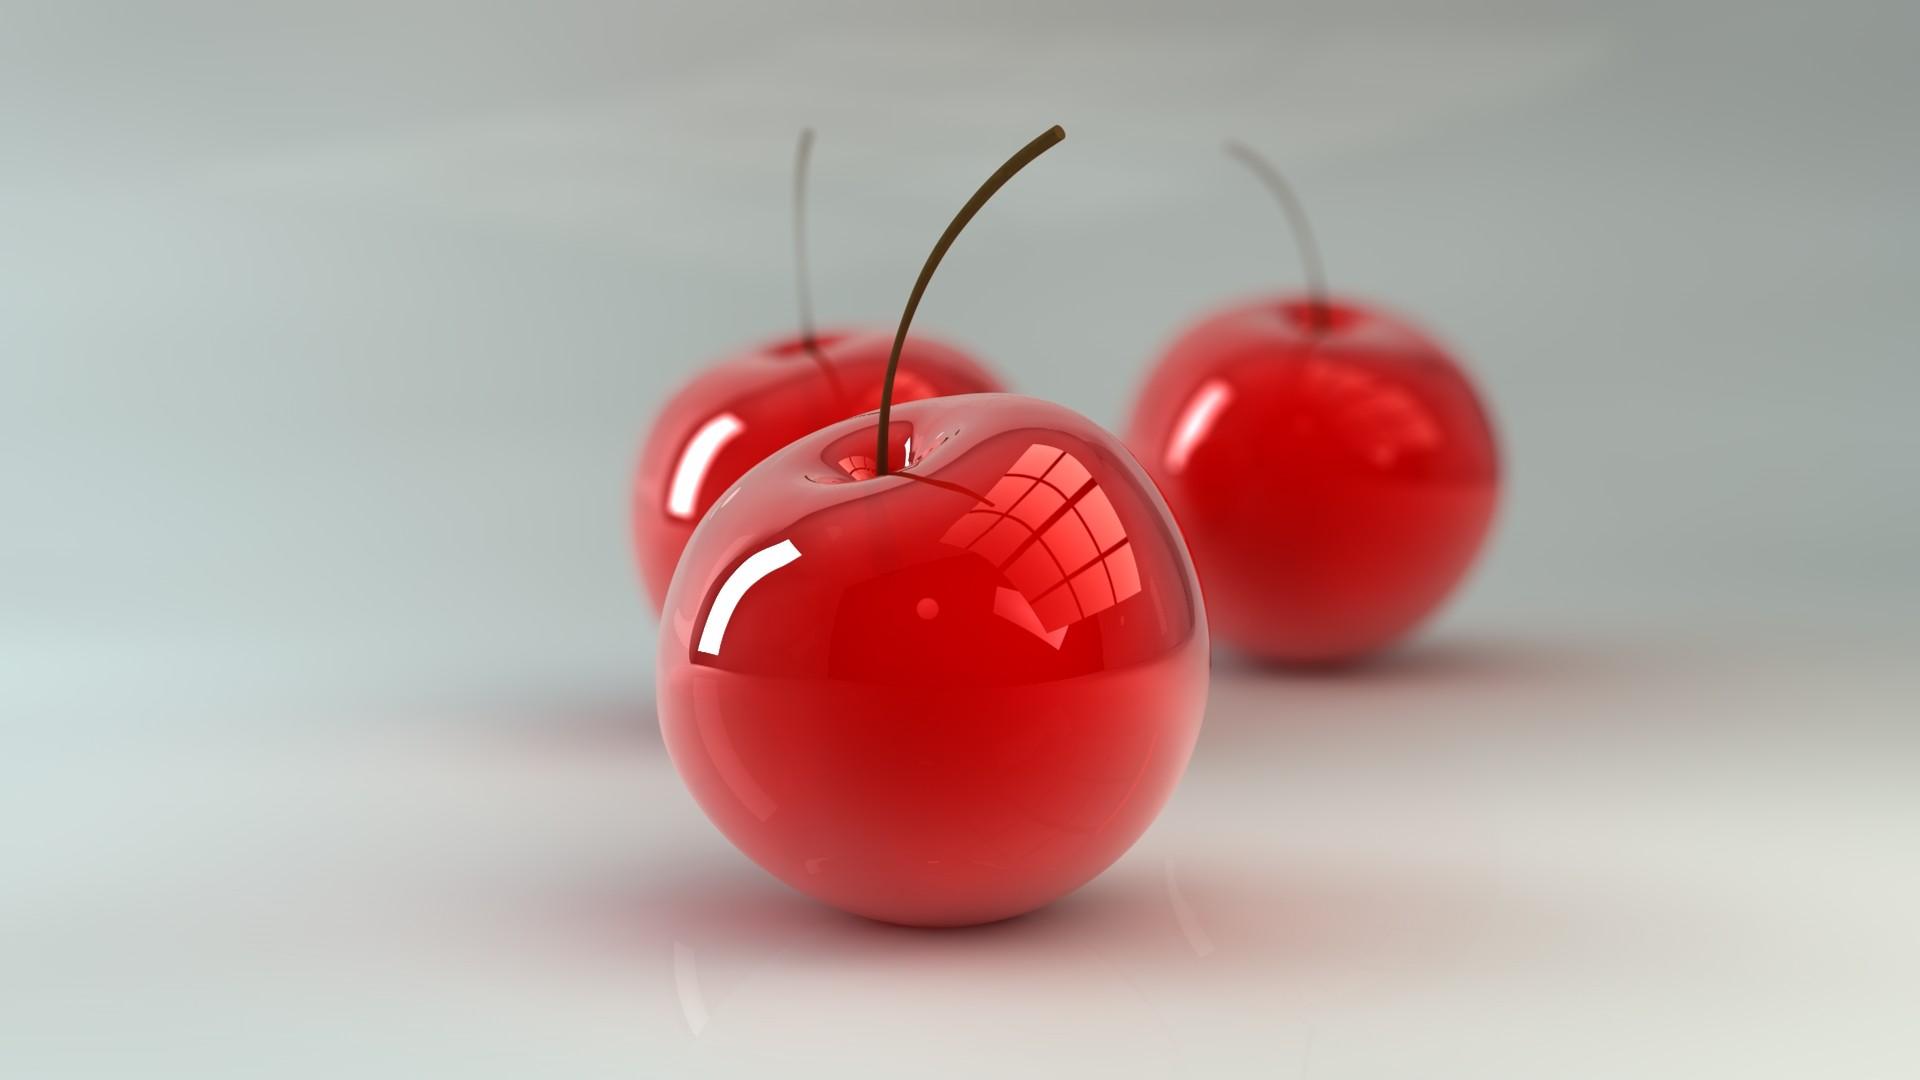 3d glossy cherries wallpaper 50151